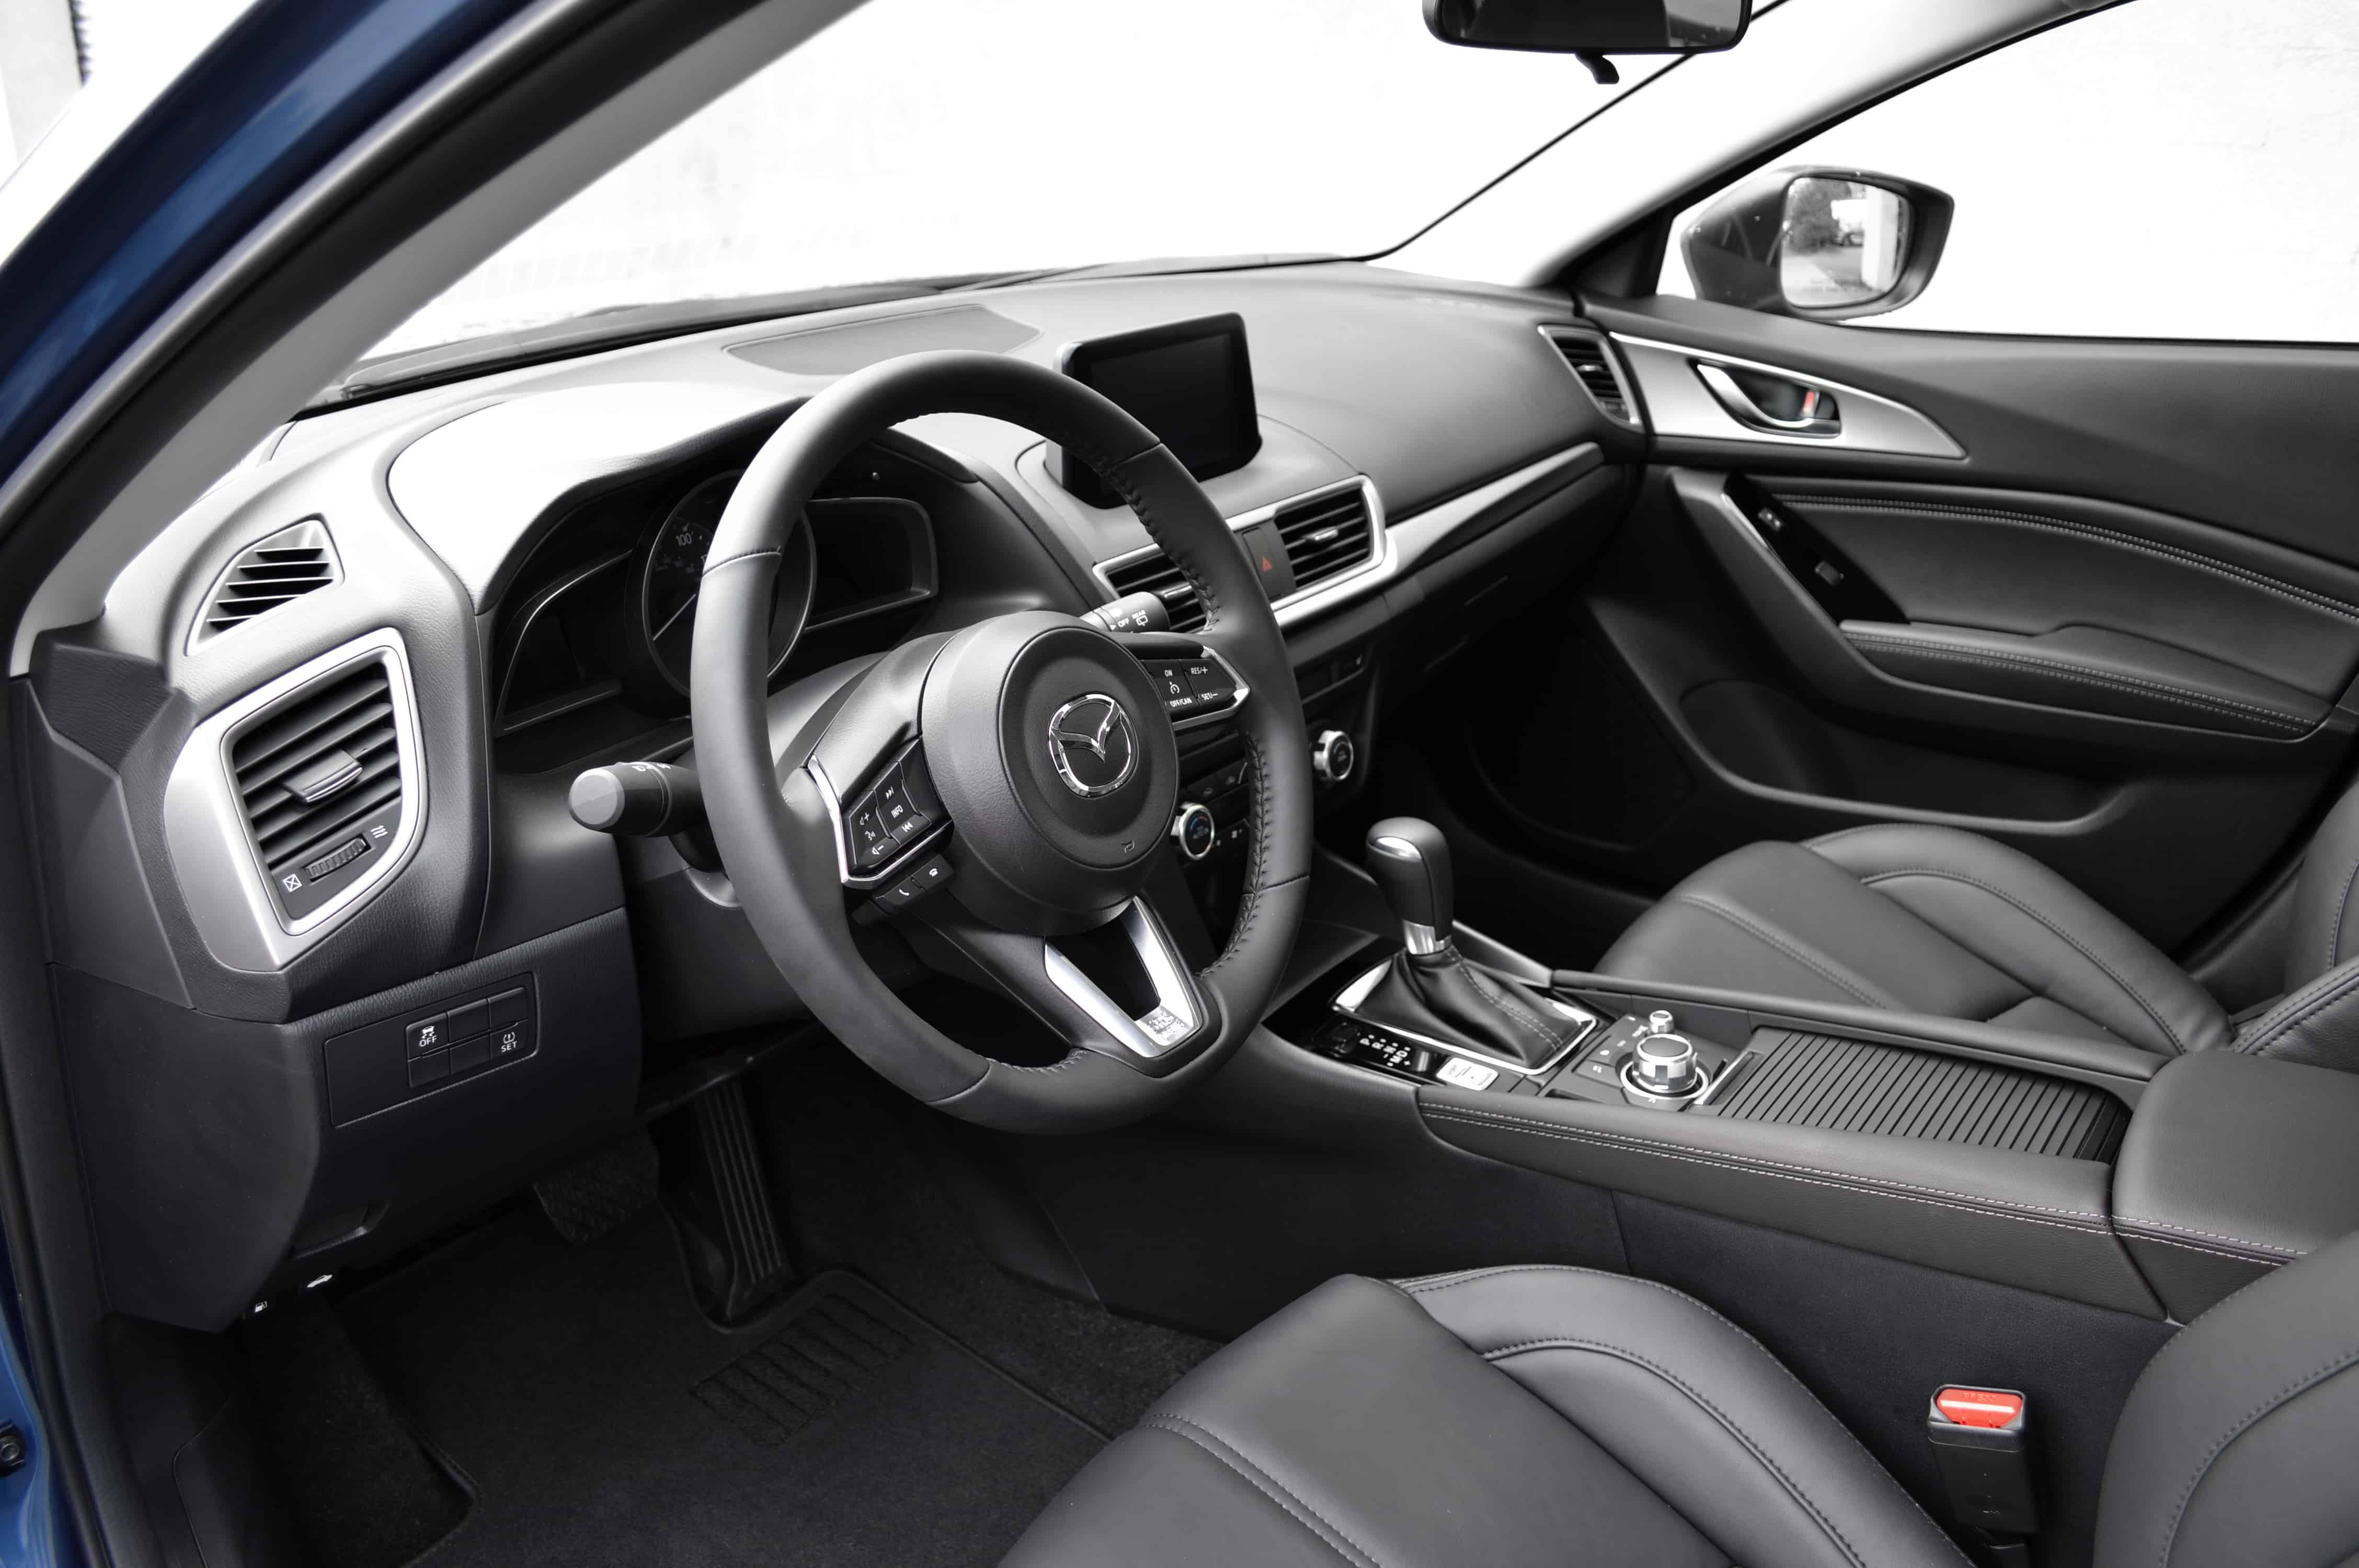 faceoff mazda 3 vs civic hatch corksport mazda performance blog rh corksport com Mazda 3 Owners Manual Mazda 3 2017 Steering Wheel